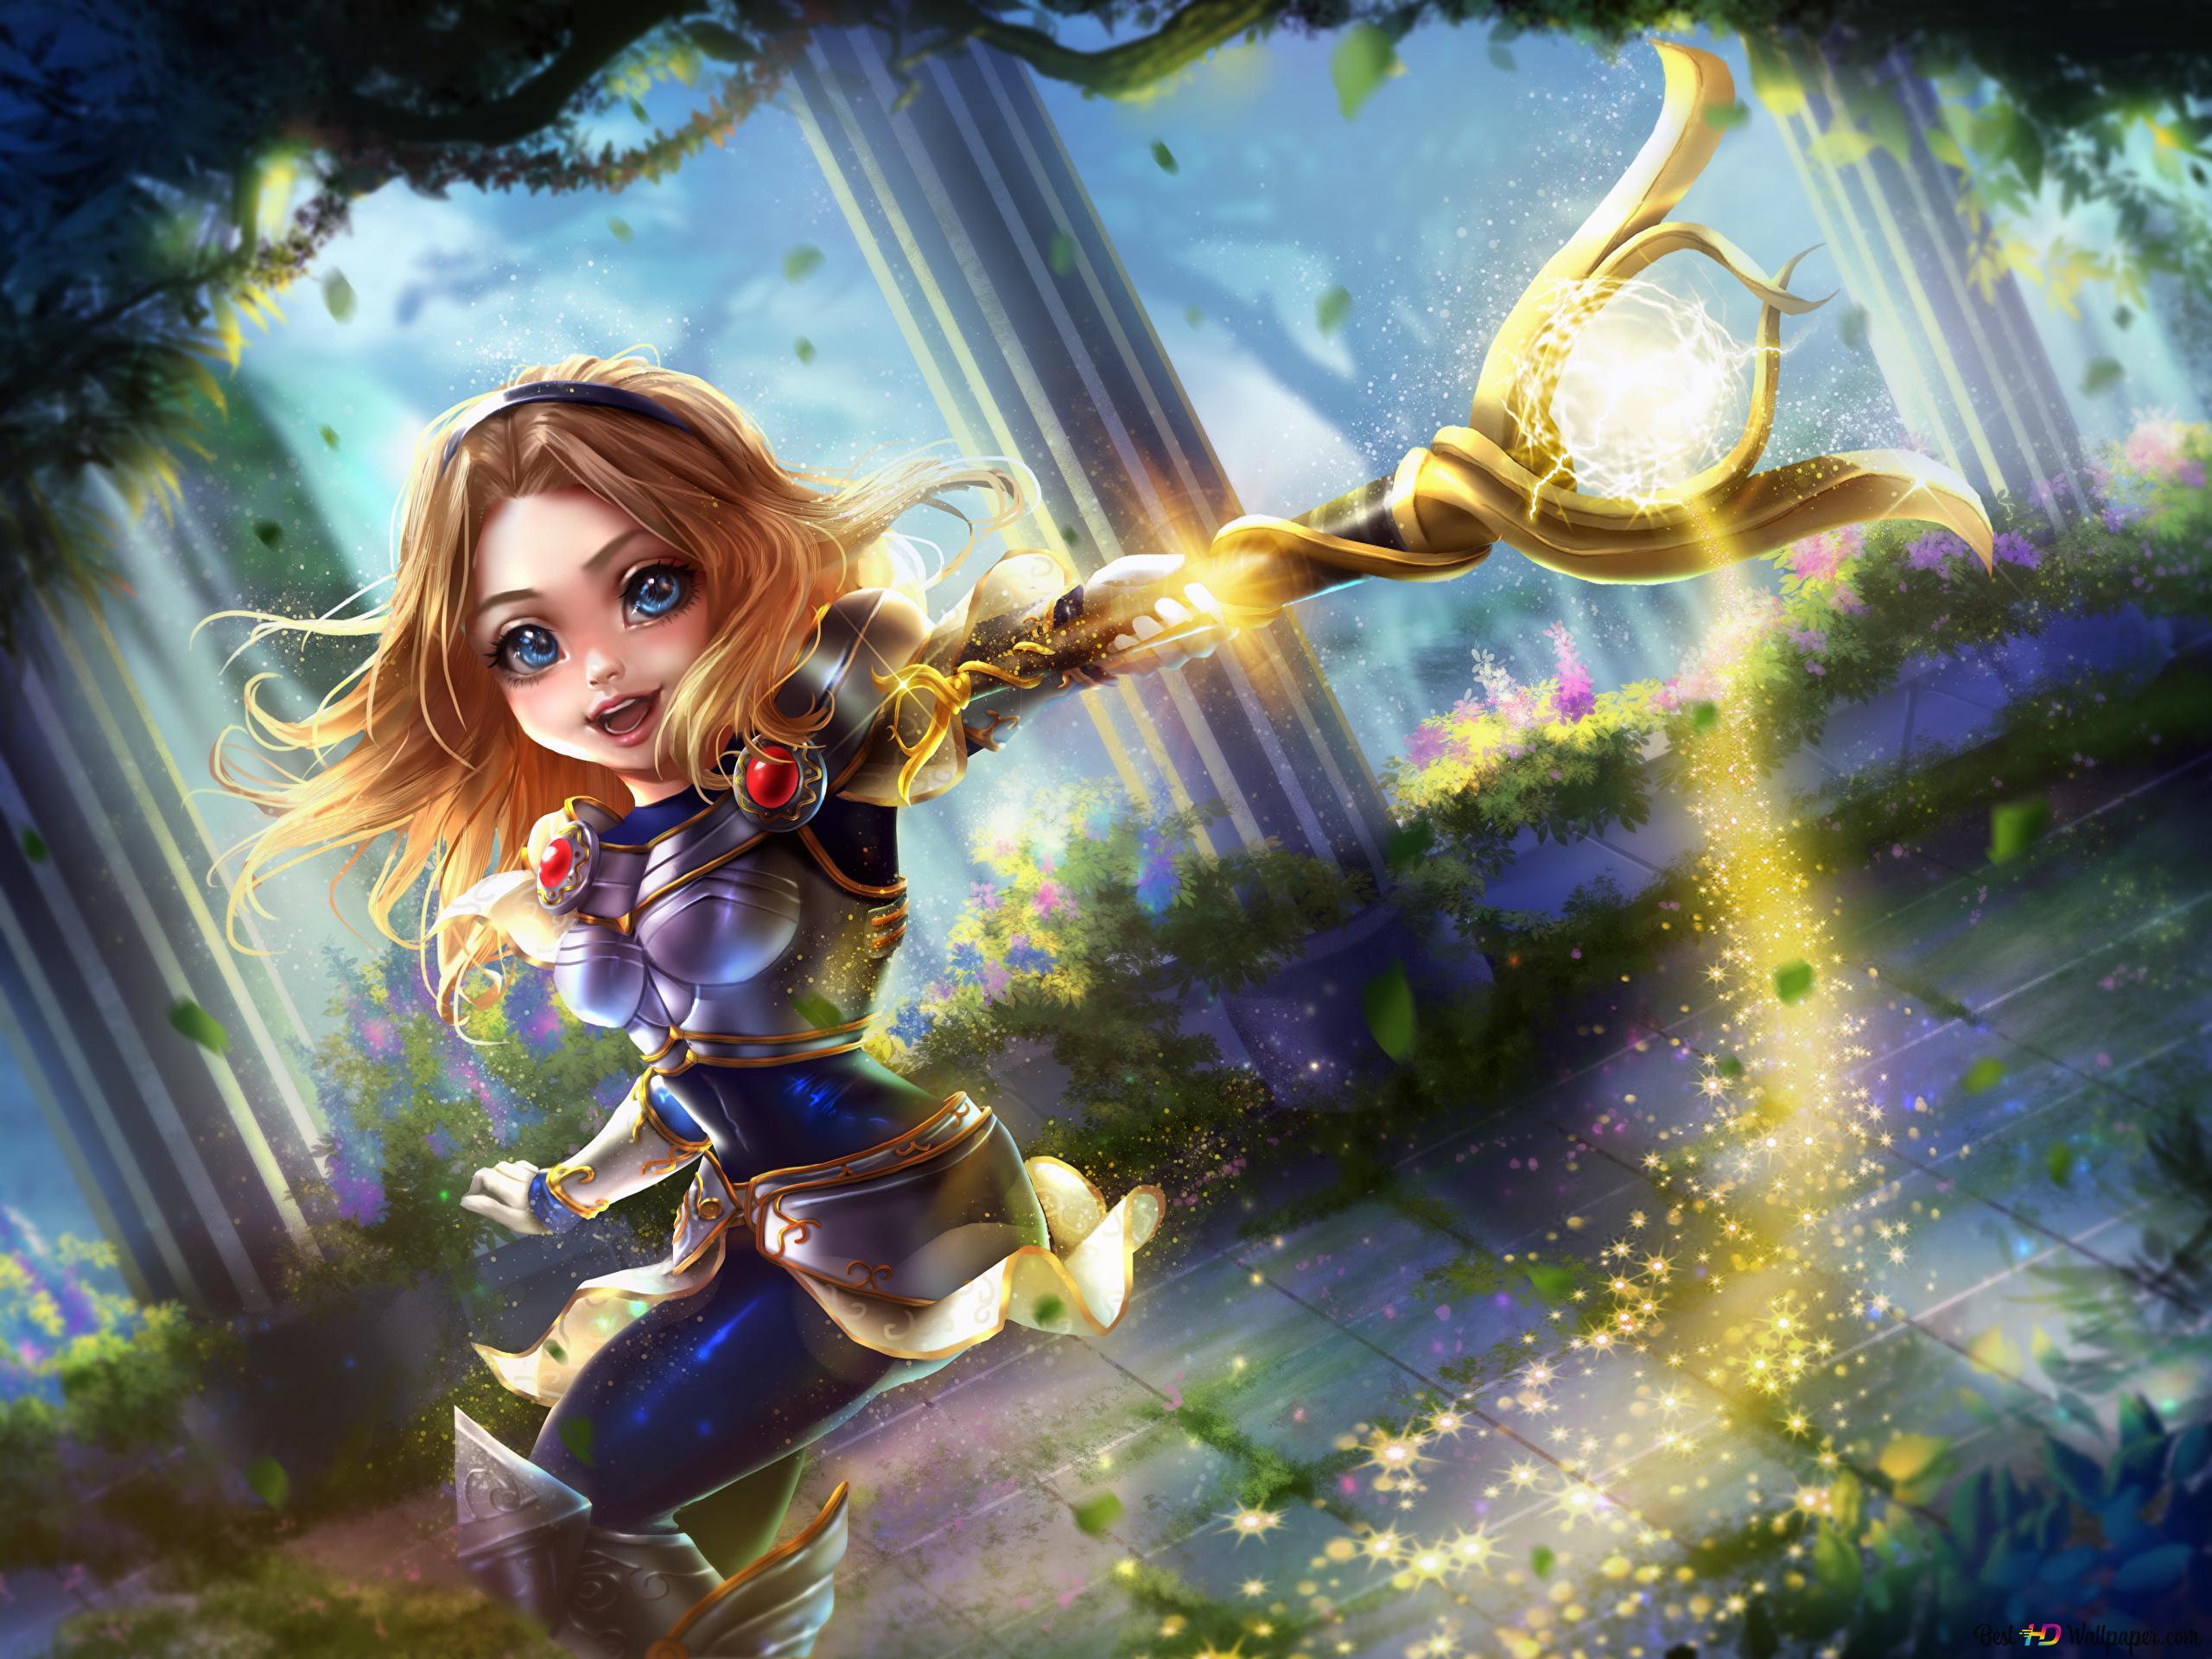 League Of Legends Chibi Lux Hd Wallpaper Download